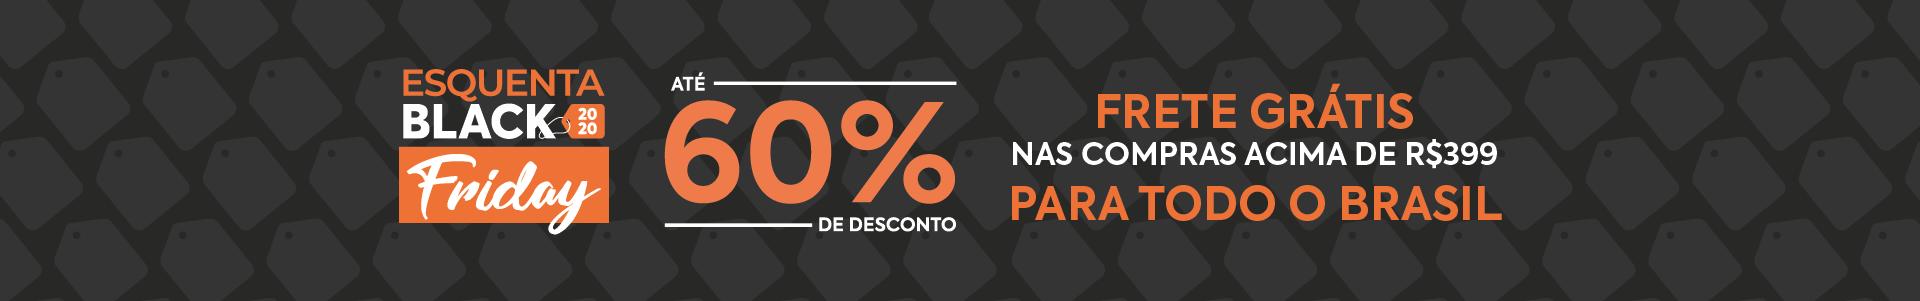 Banner Frete Gratis para todo o Brasil BF COZA